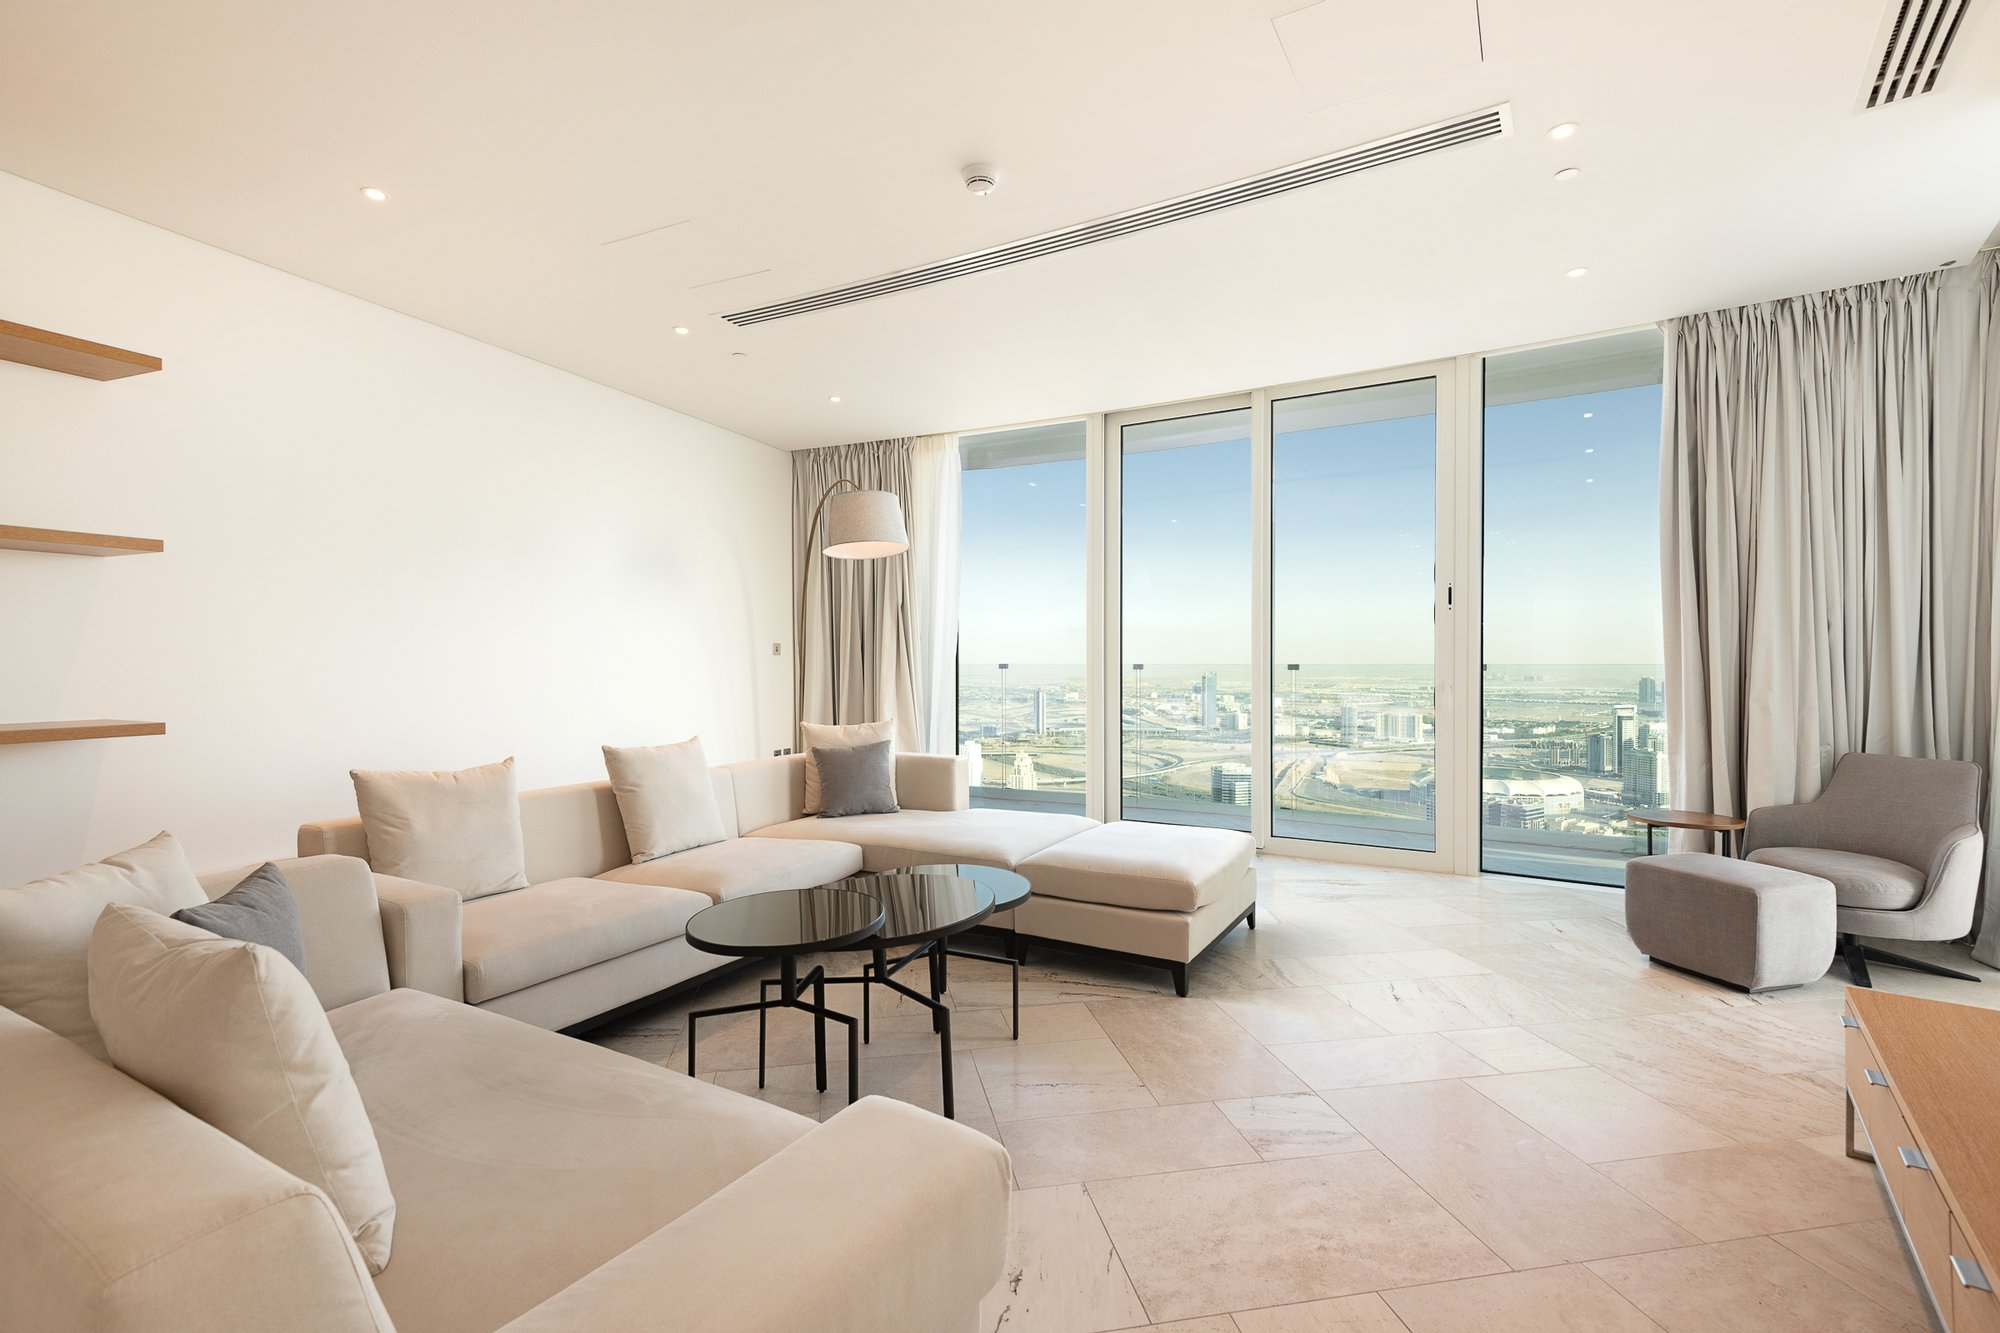 Appartamento a Dubai, Dubai, Emirati Arabi Uniti 1 - 11425131